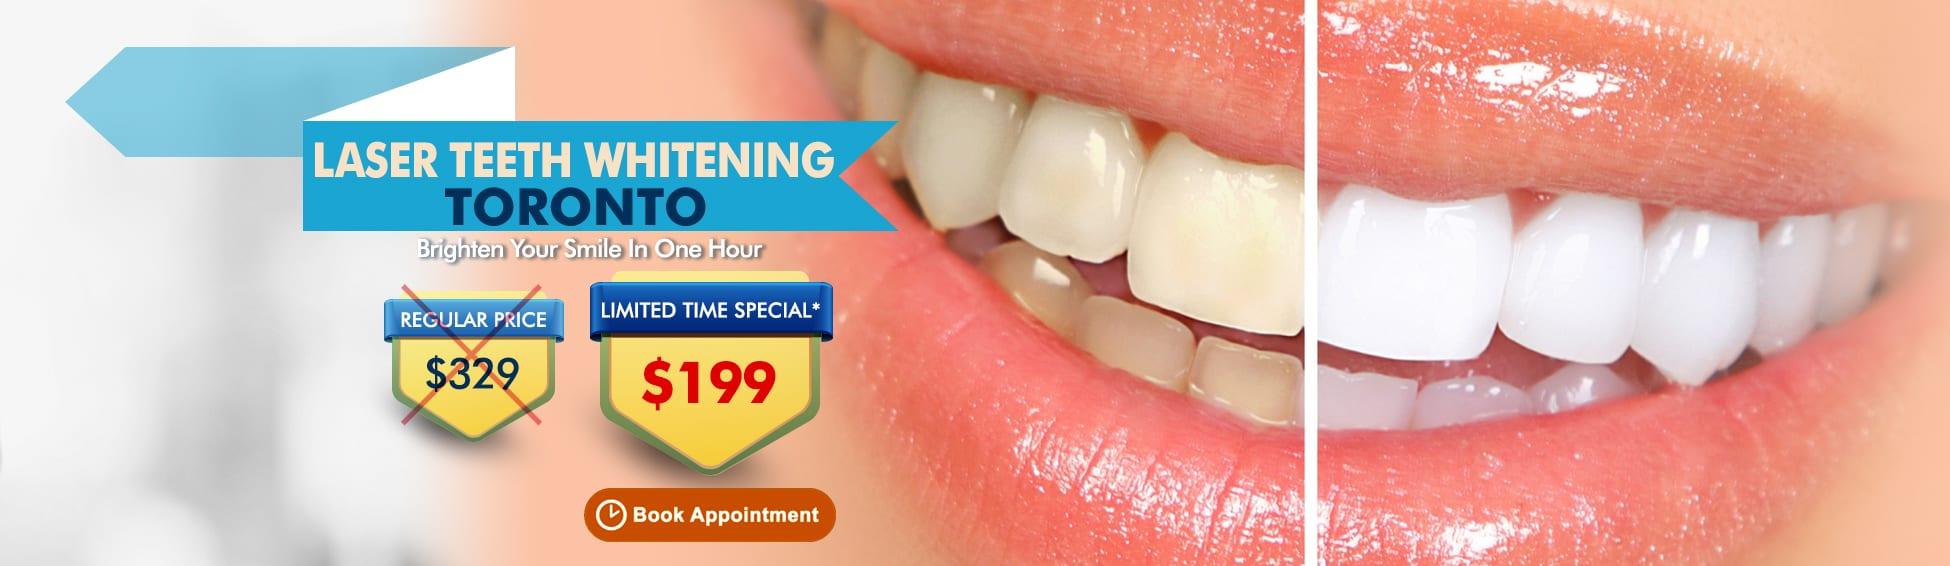 Laser Teeth Whitening Toronto Ontario - $329 $199 _Toronto